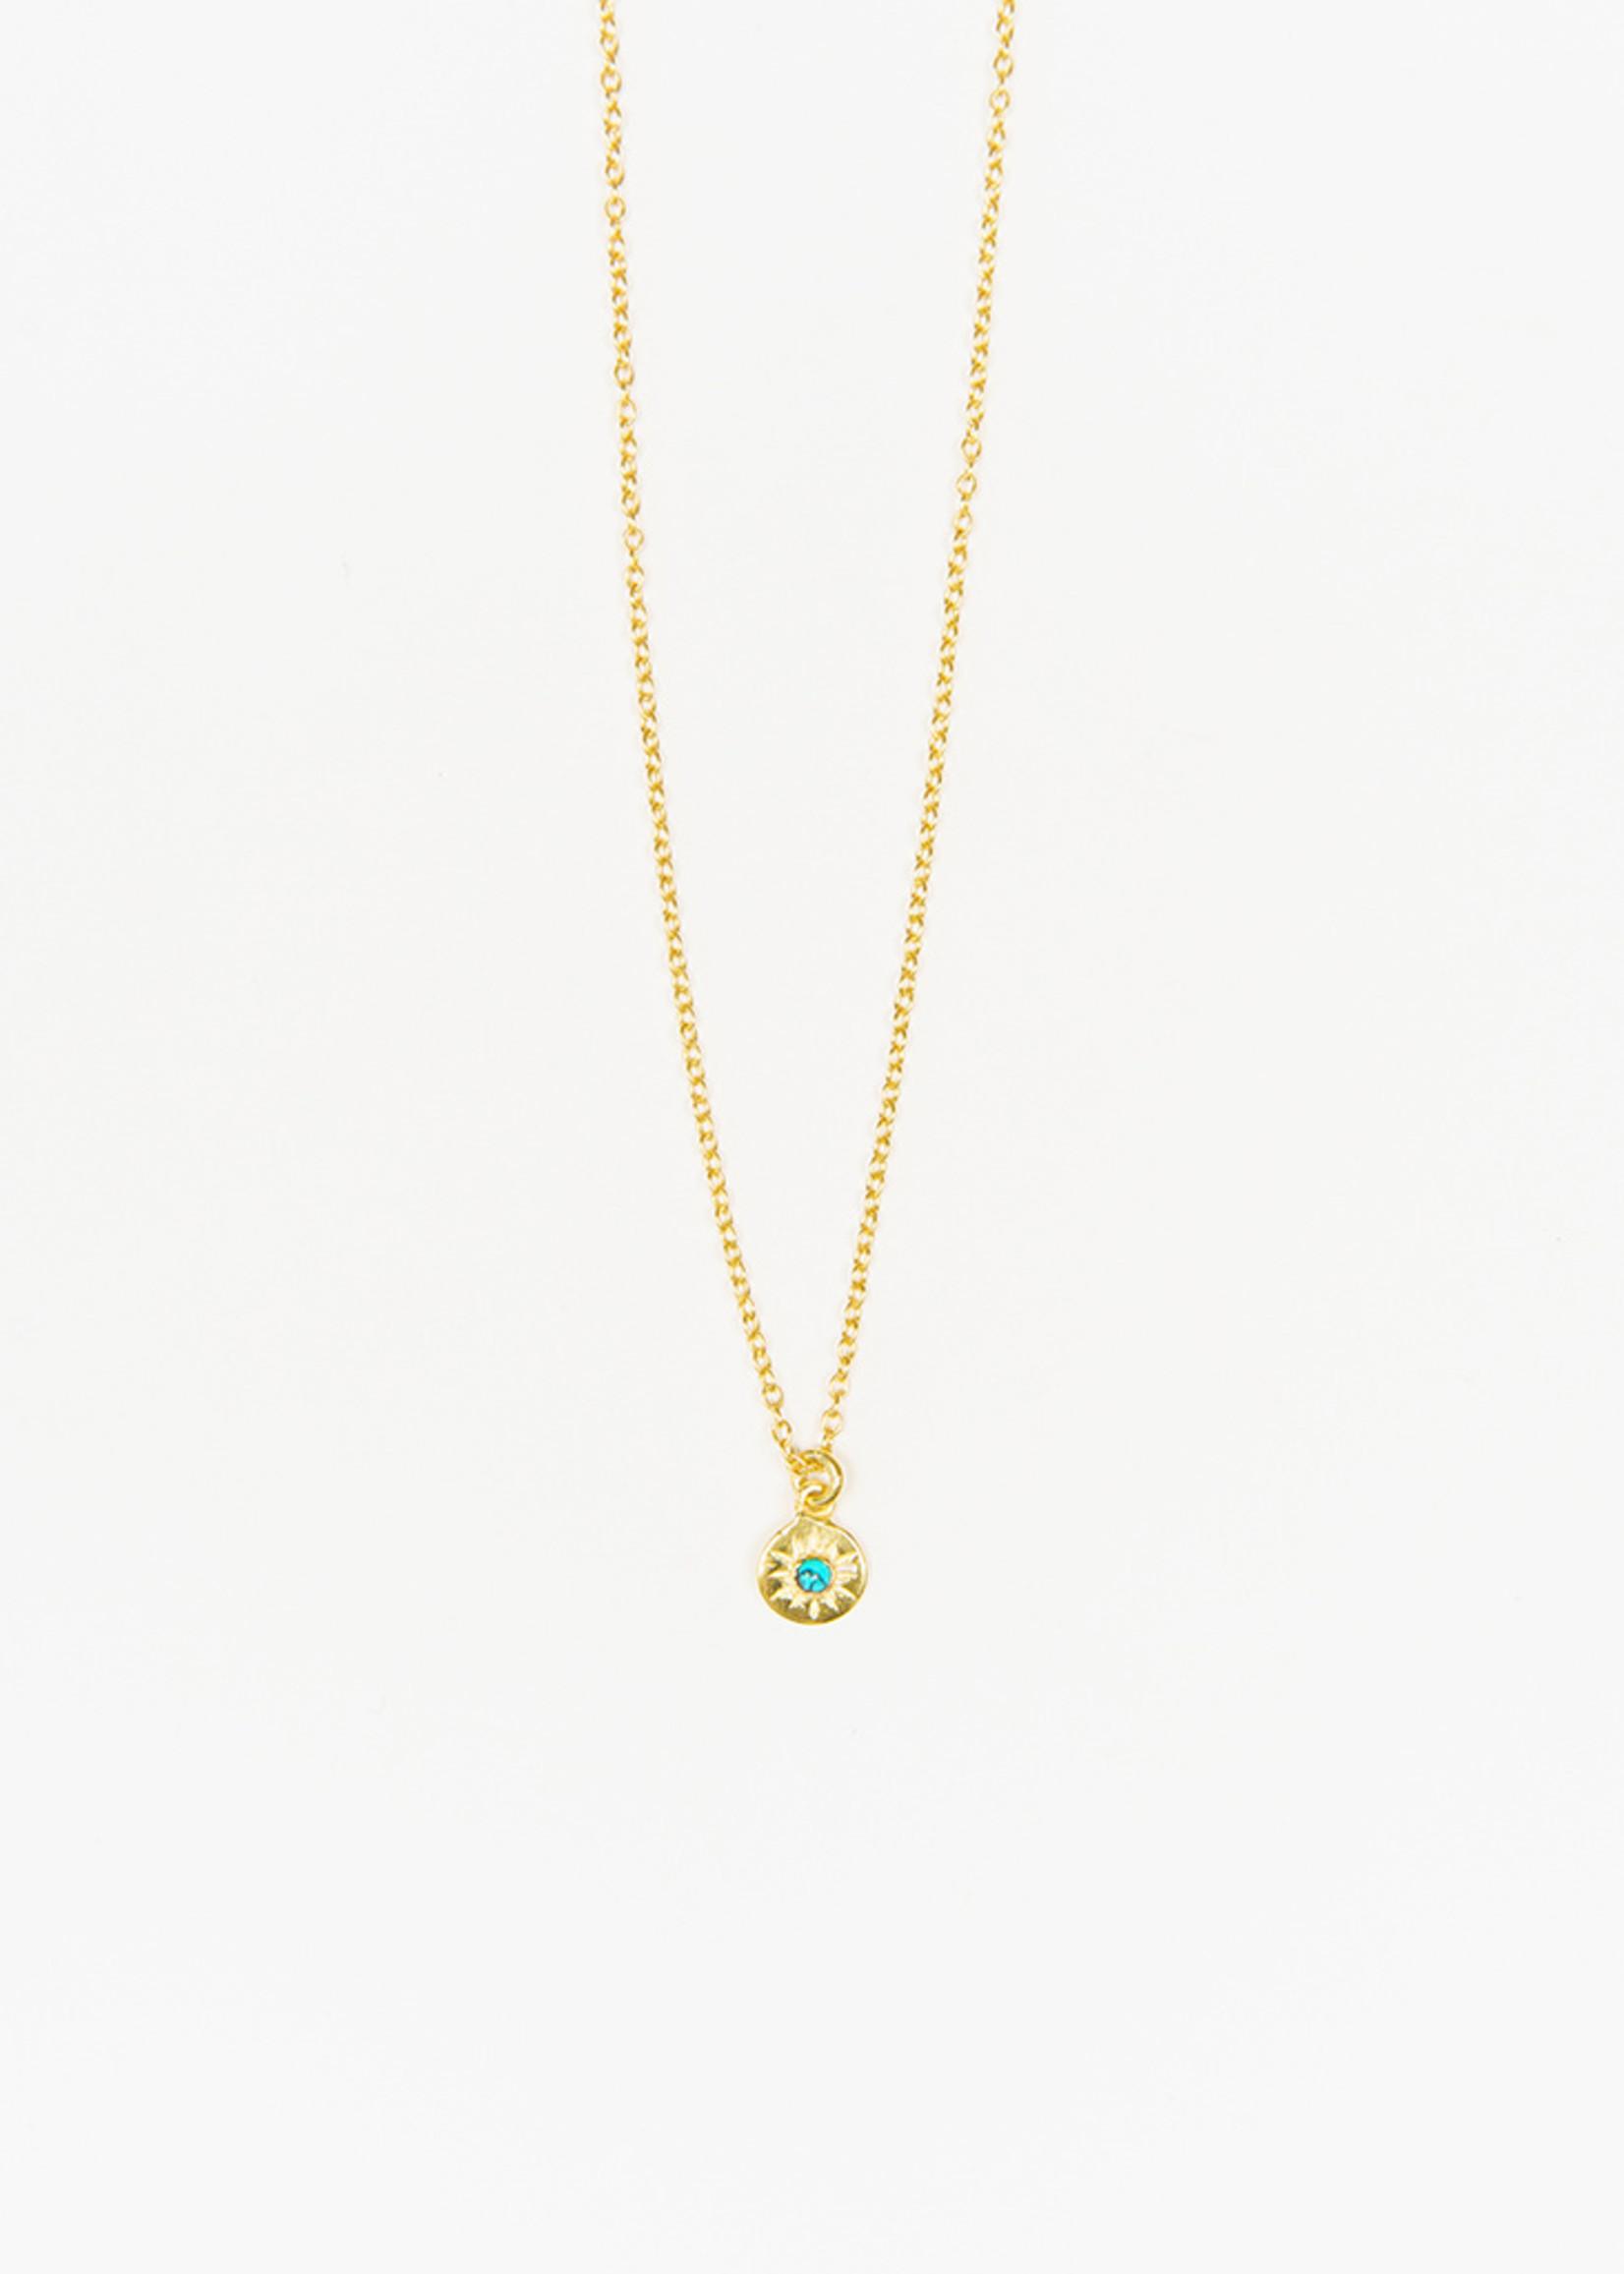 Turquoise Starburst Necklace